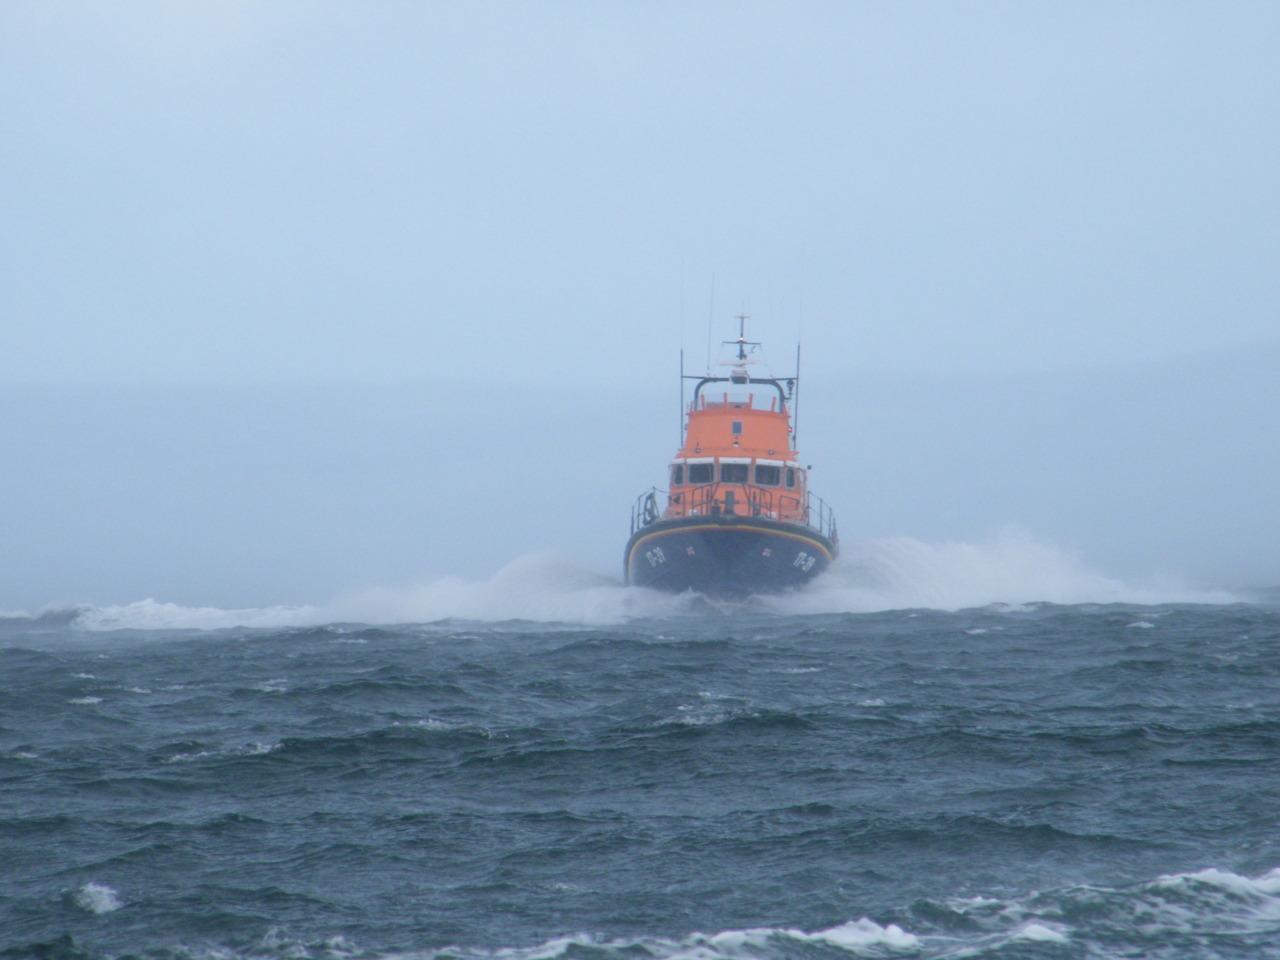 Tobermory Lifeboat, Elizabeth Fairlie Ramsey 17-39